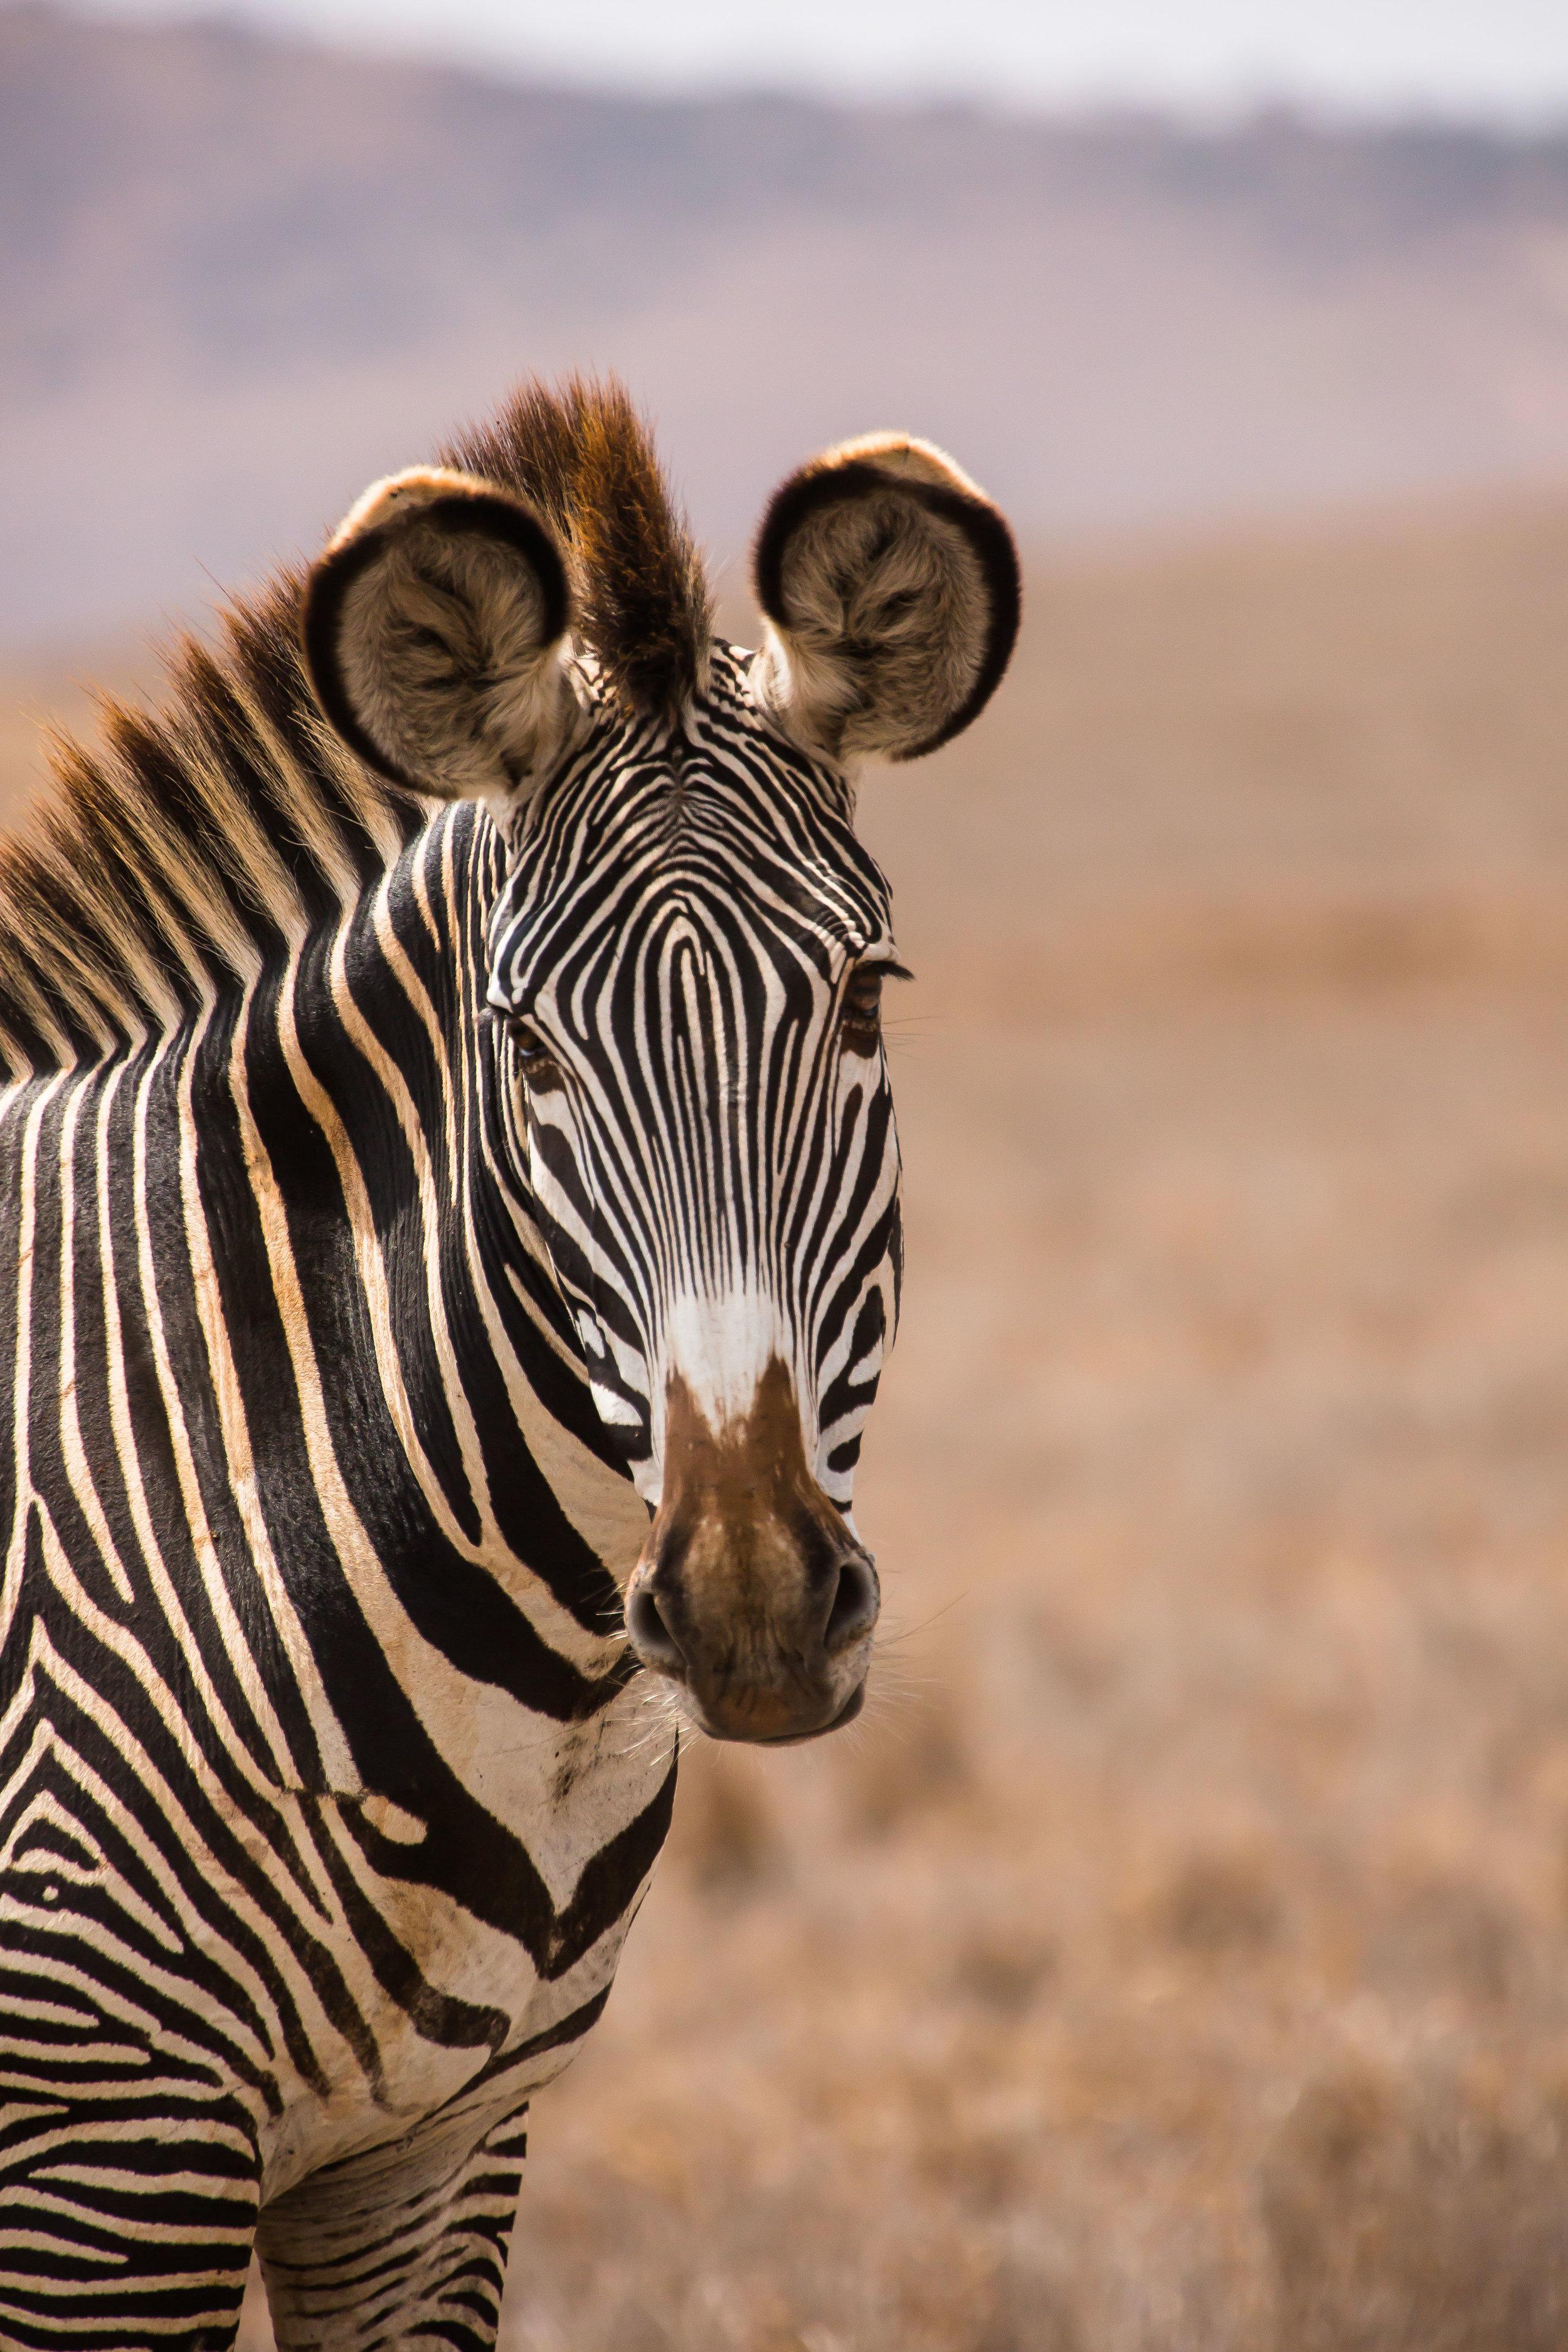 Animals_Website_Maxblakesberg-4.jpg